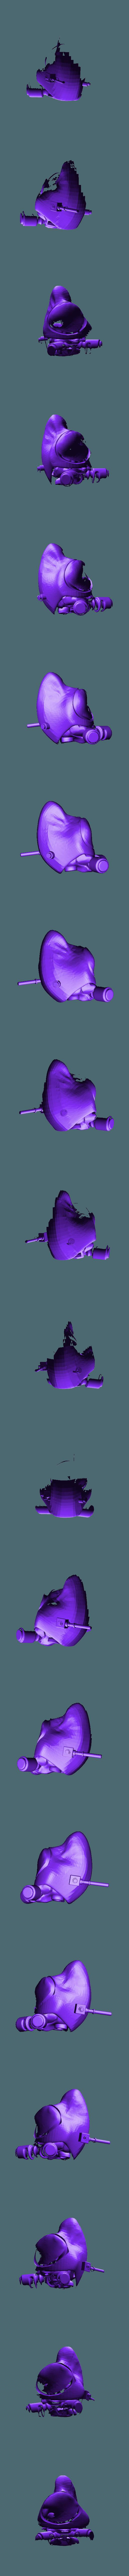 Reposed_Ranger_5.1_-_Head.stl Download free STL file Martian Mechanized Rangers • 3D printable object, ErikTheHeretek